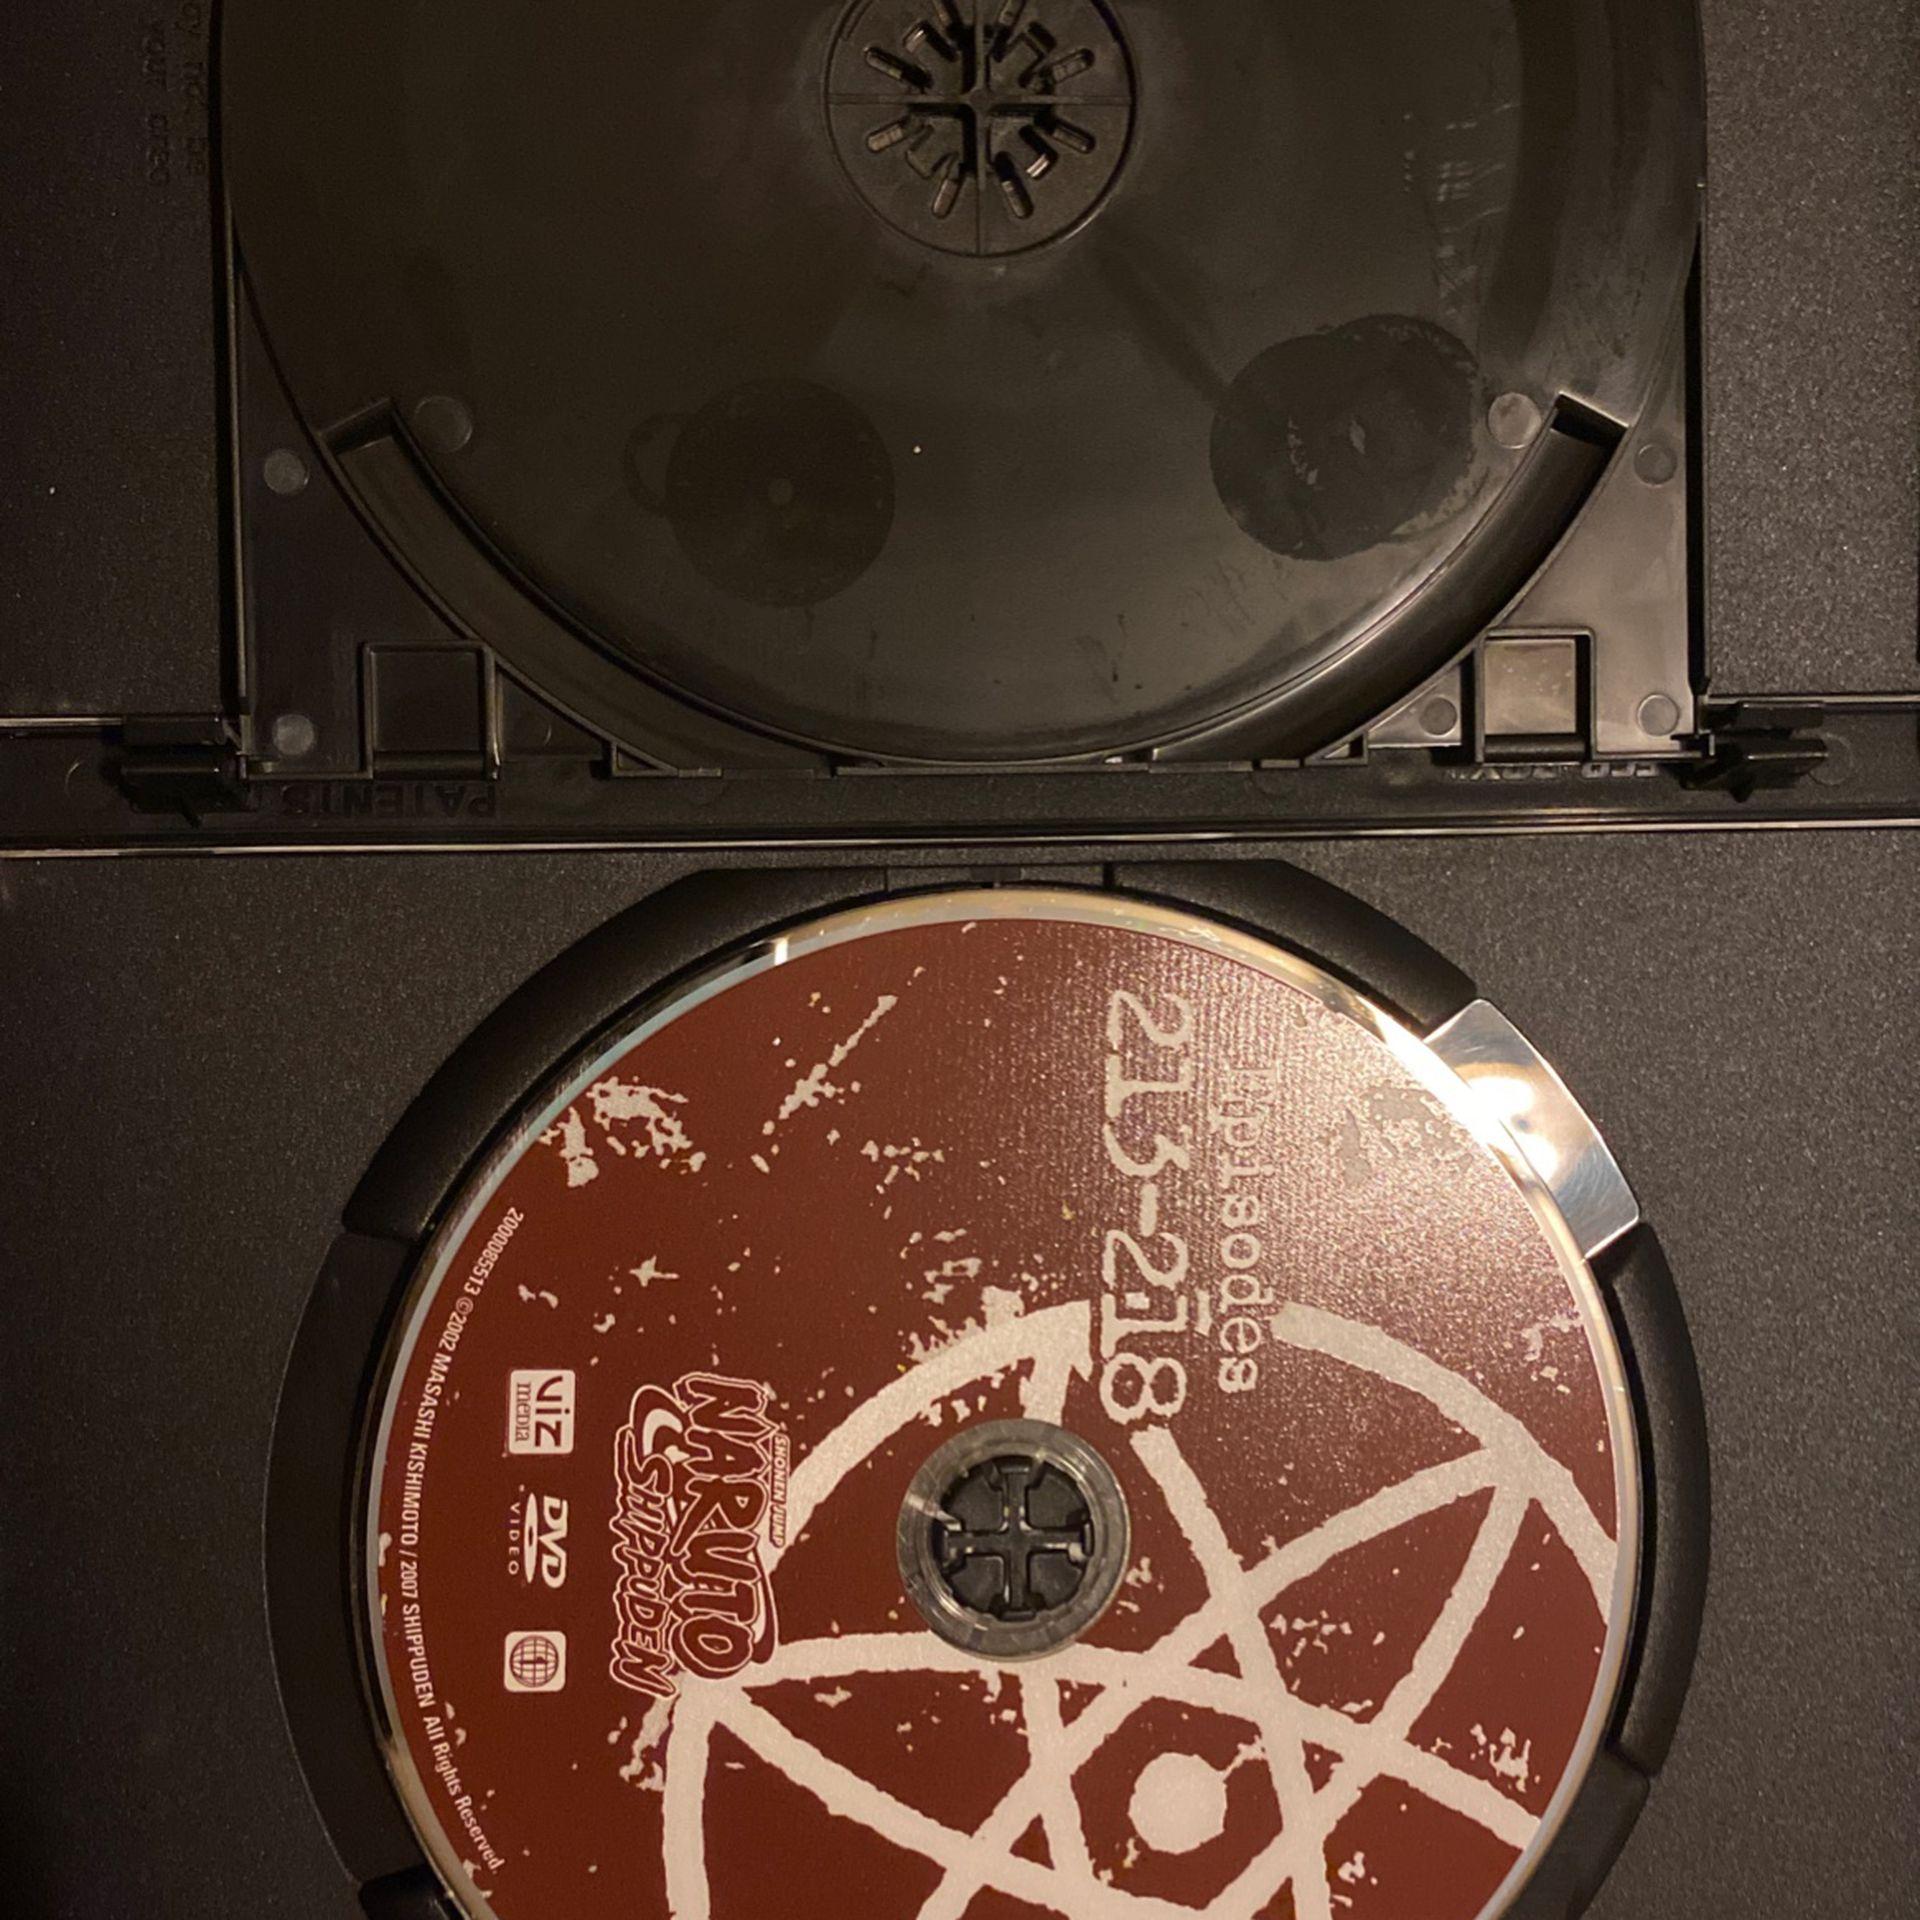 NARUTO SHIPPUDEN (17) 2 DISC SET